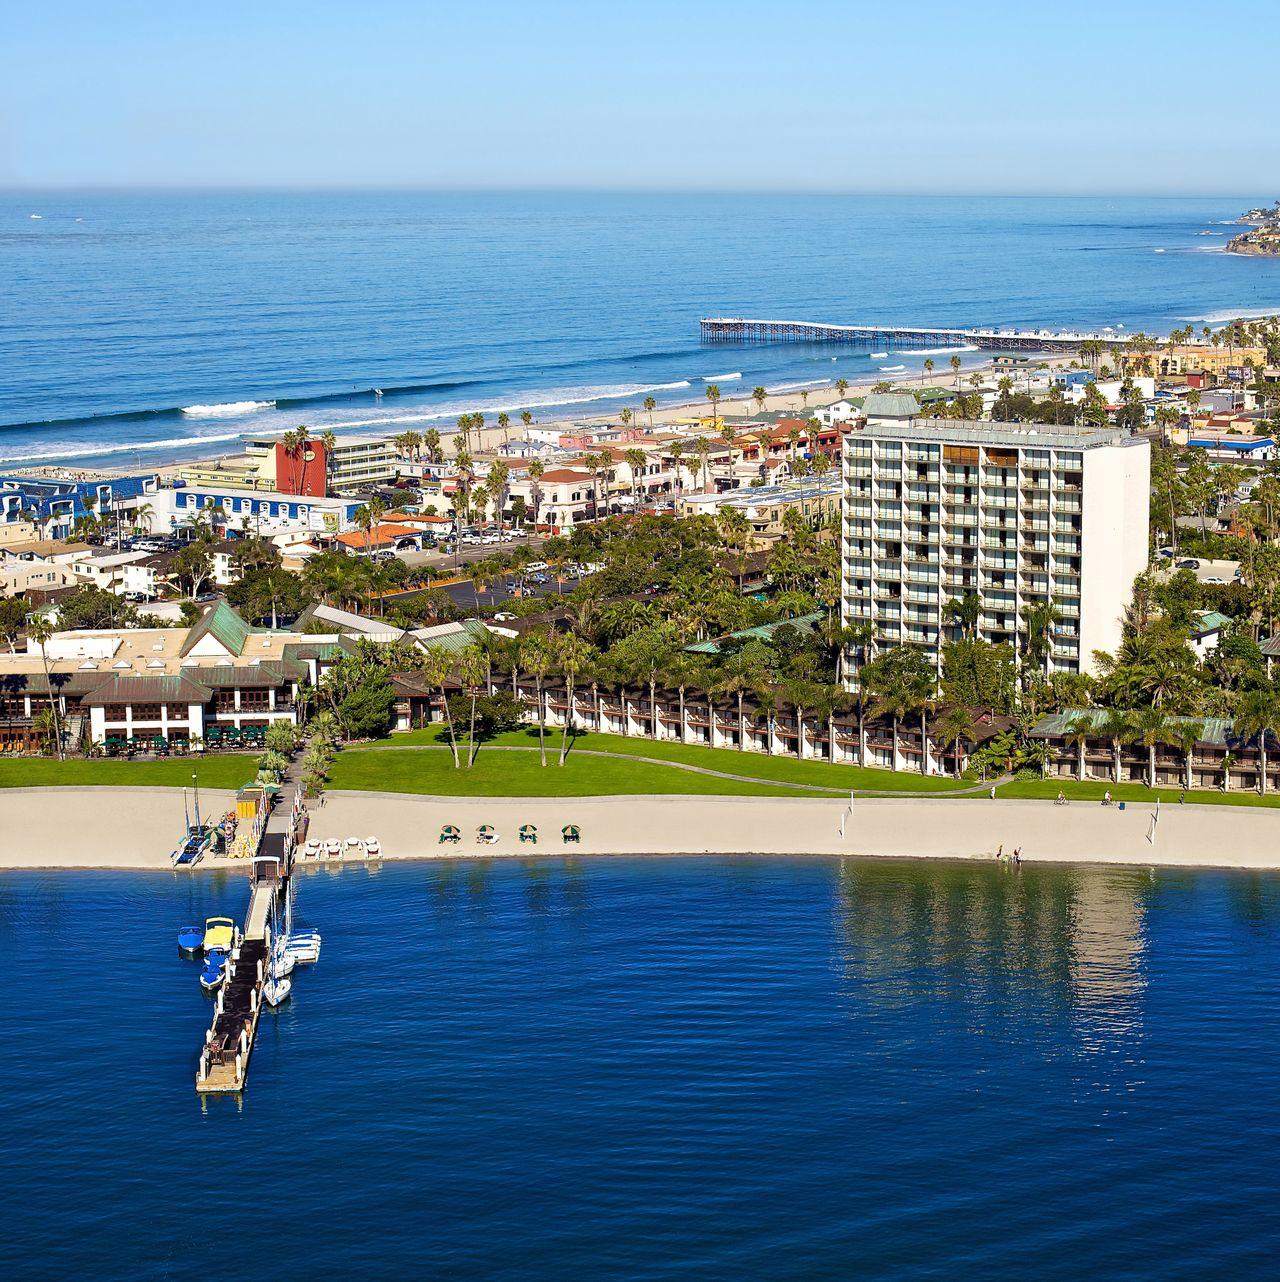 Catamaran Hotel San Diego